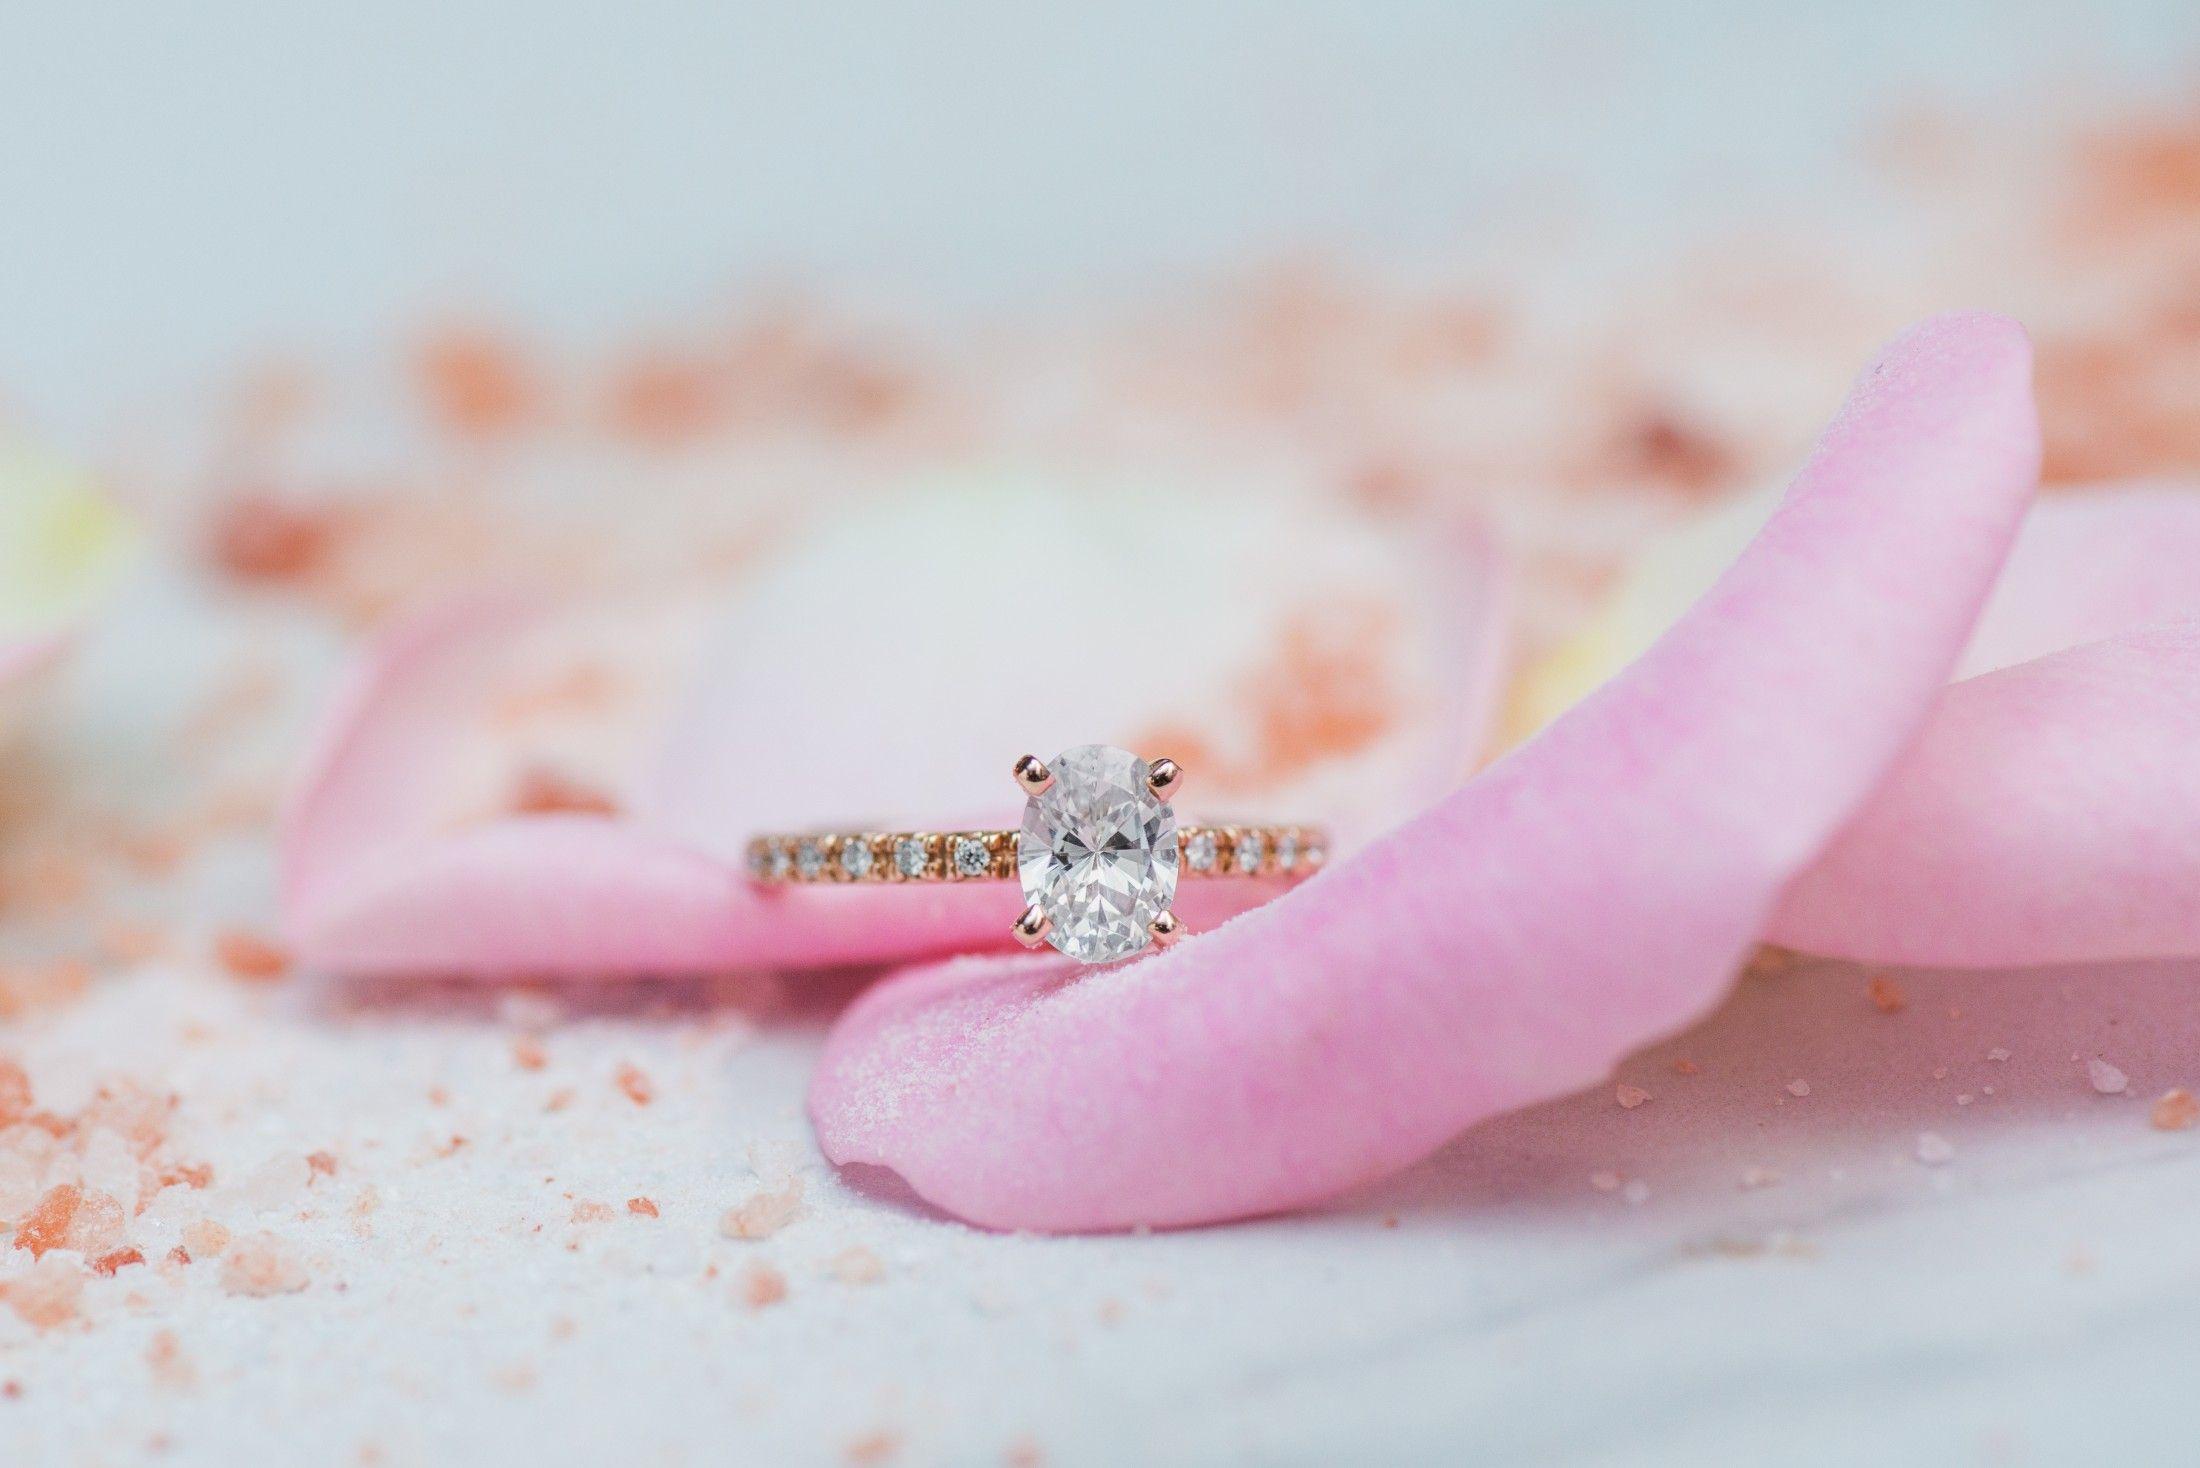 ad] Shop hundreds of beautiful rings at JamesAllen.com! | Women\'s ...